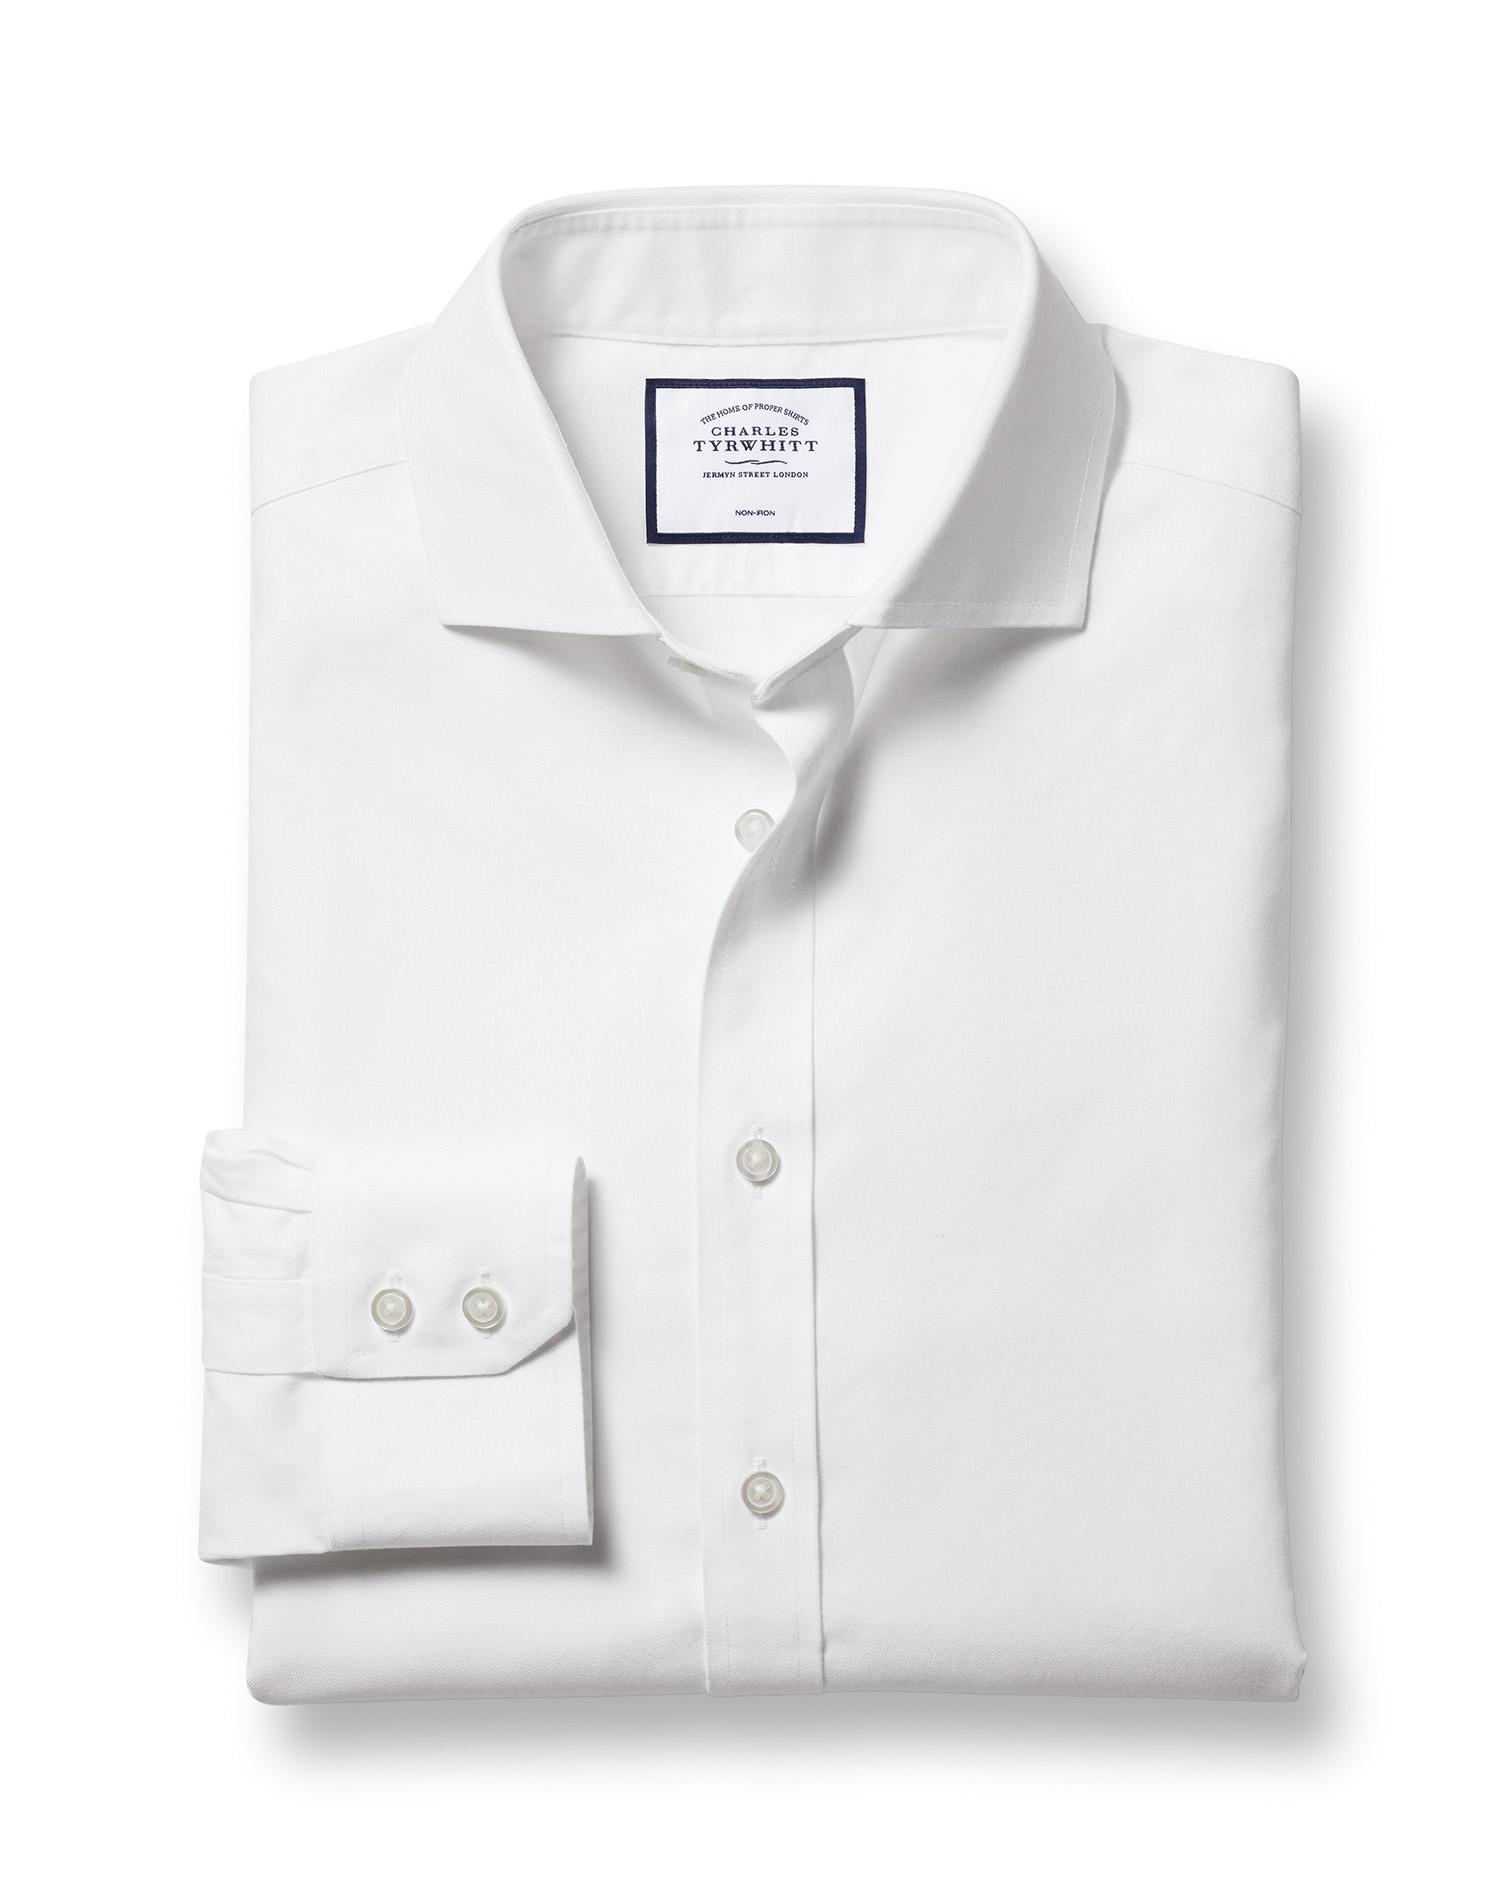 Slim Fit Cutaway Non-Iron Twill White Cotton Formal Shirt Single Cuff Size 15/32 by Charles Tyrwhitt